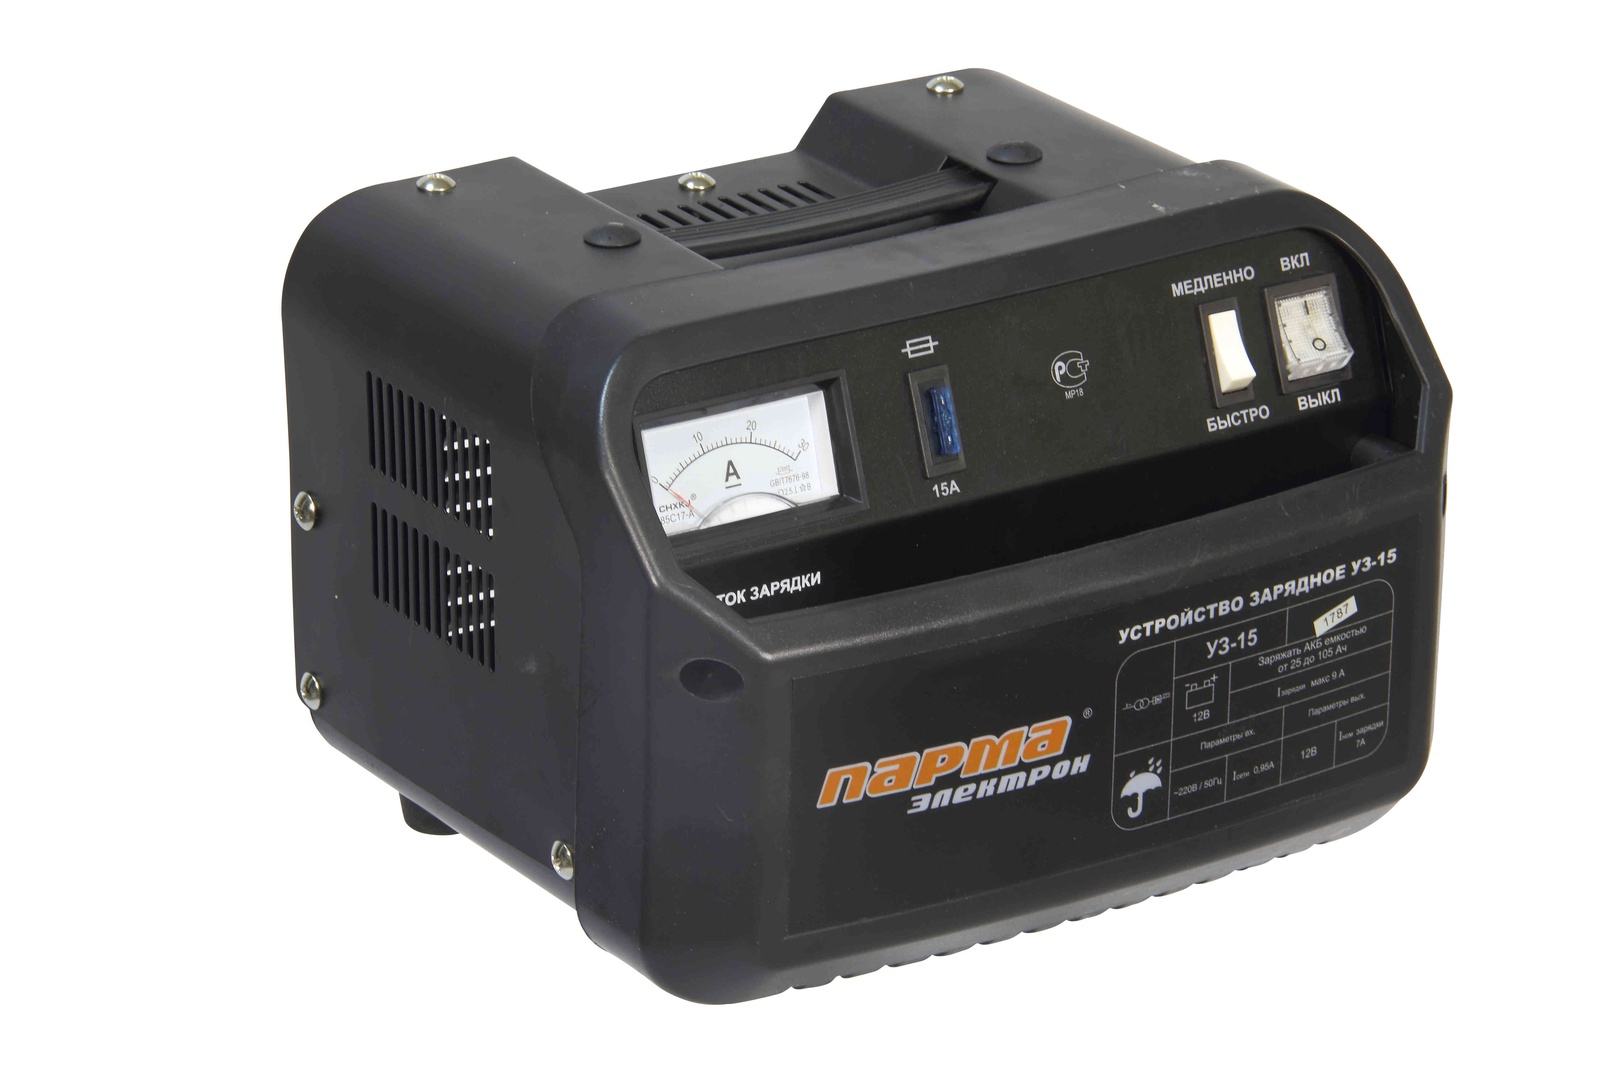 Устройство зарядное ПАРМА-Электрон УЗ-15 (150 Вт, 12 В, 25-105 Ач) ПАРМА зарядное устройство калибр уз 10а